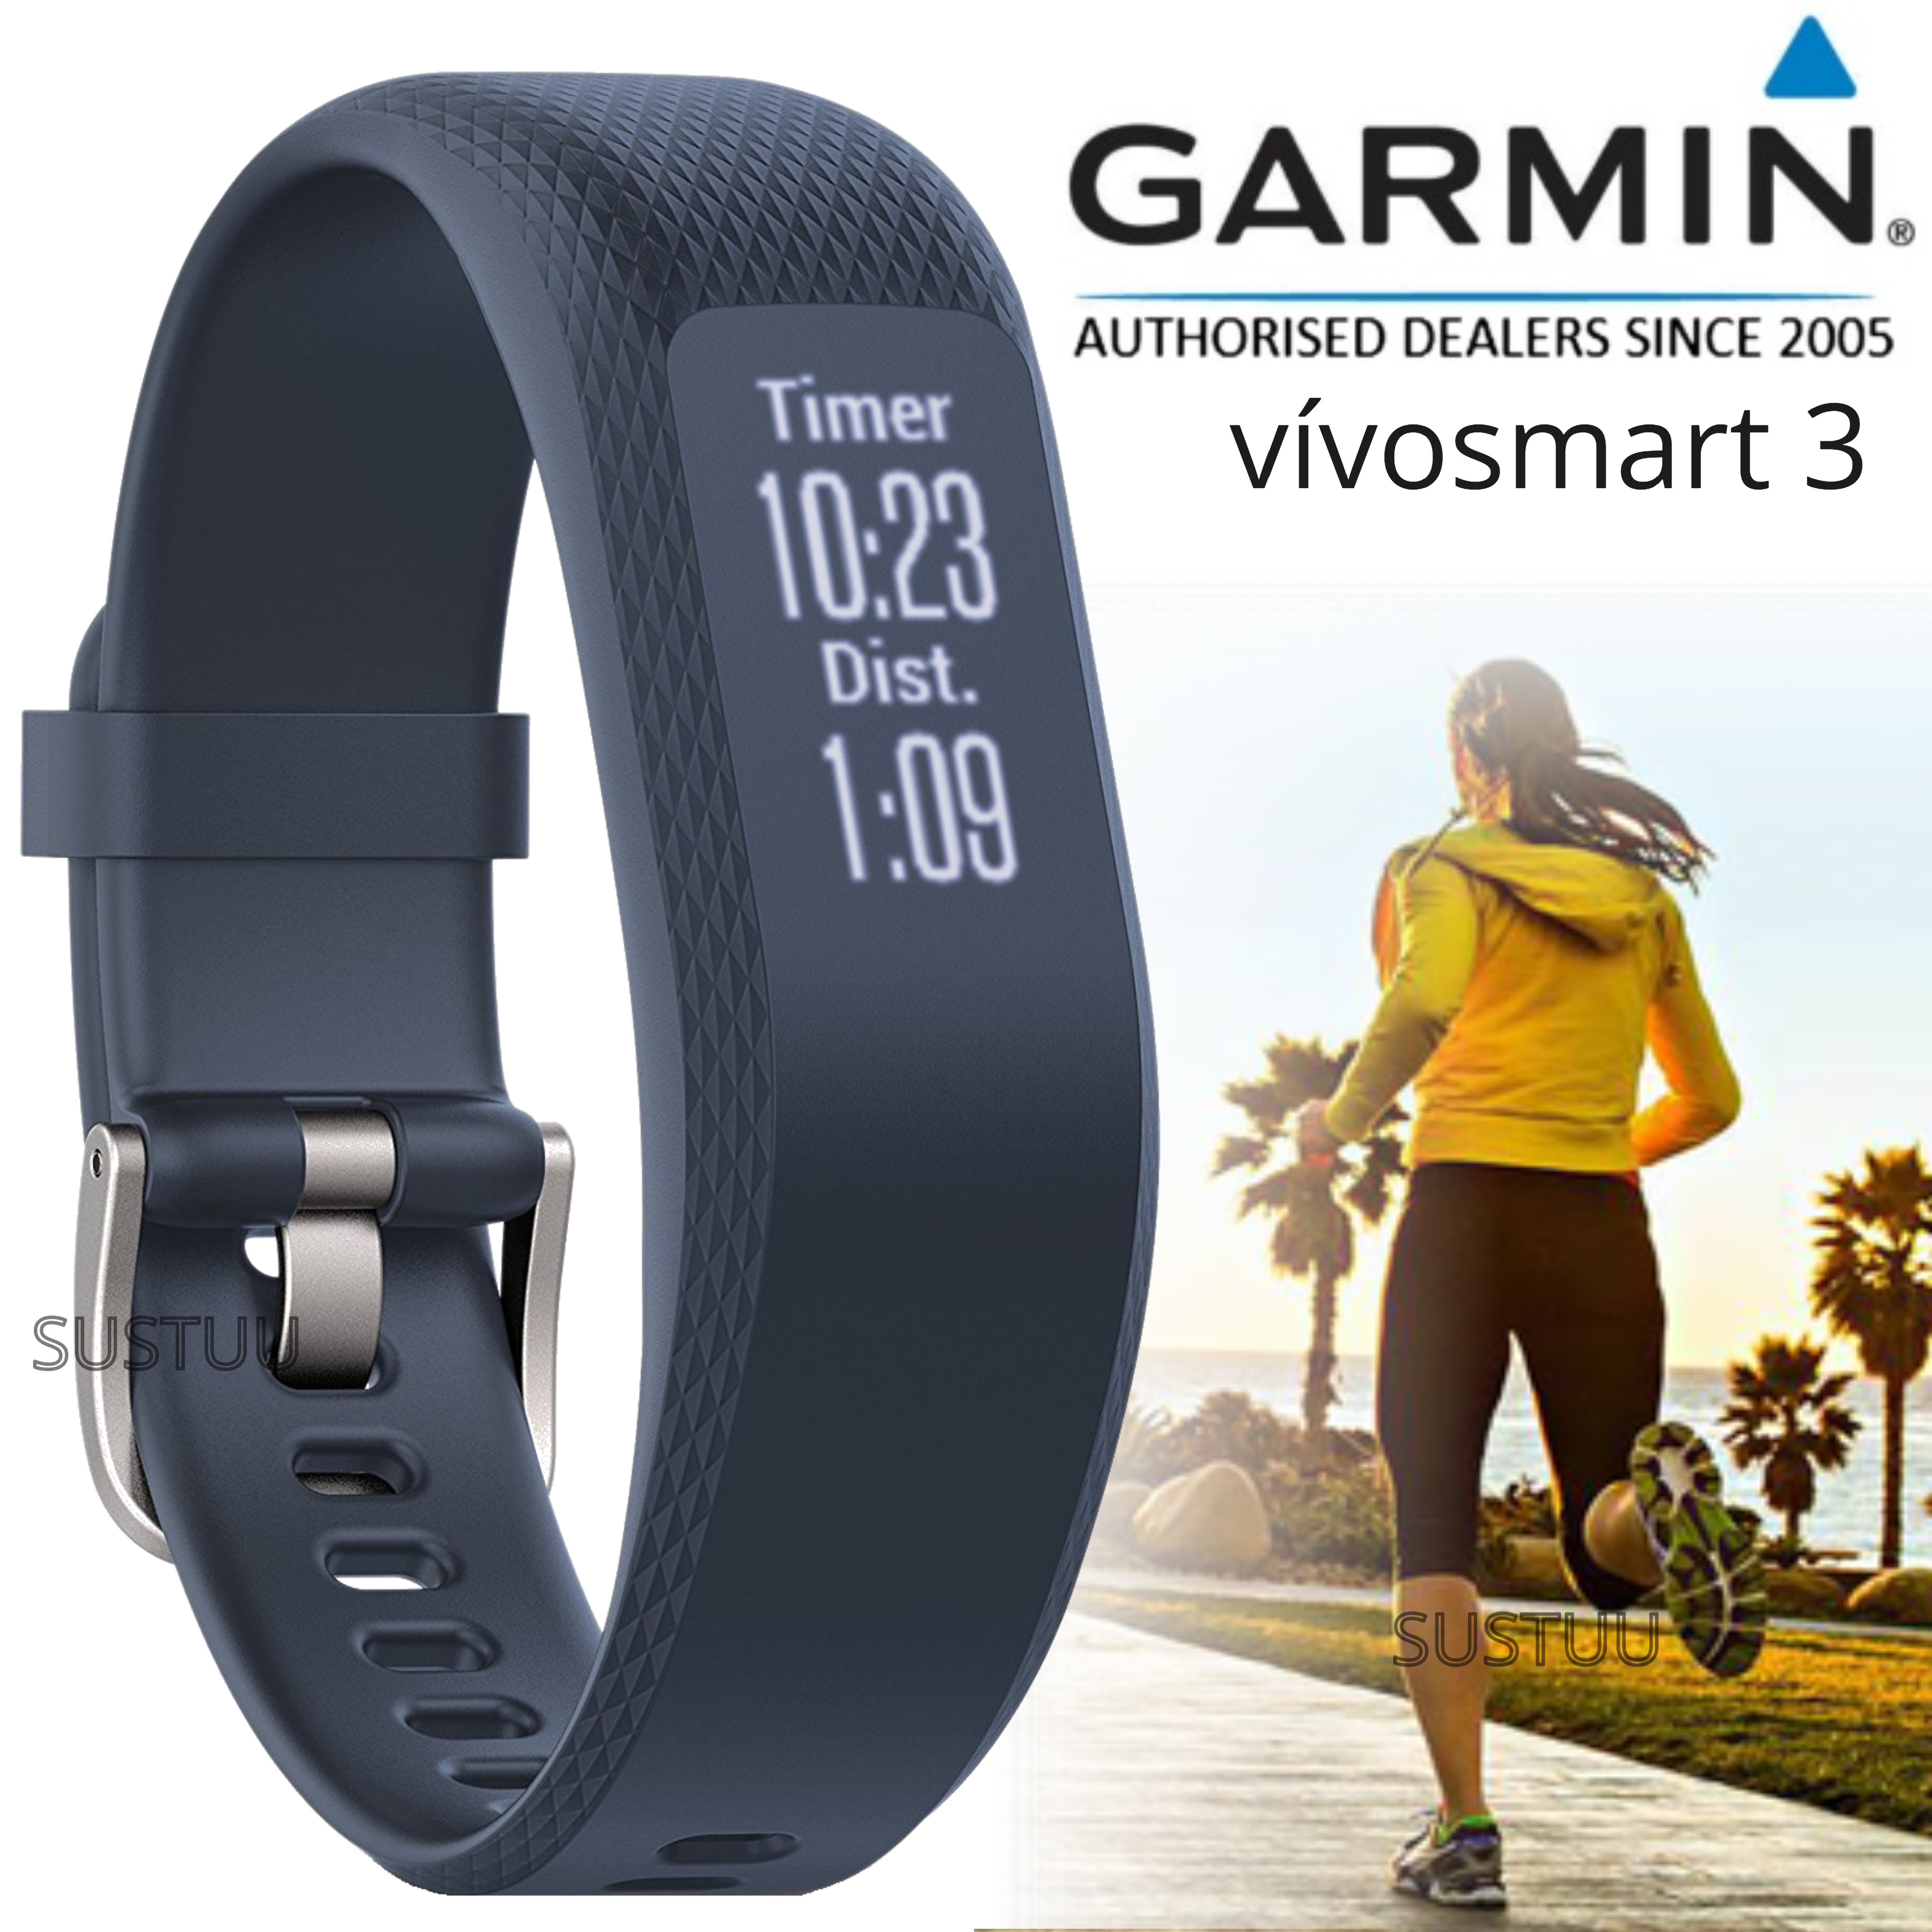 Garmin Vivosmart 3 Fitness Sports Watch|Heart Rate/Activity Tracker|Blue Small